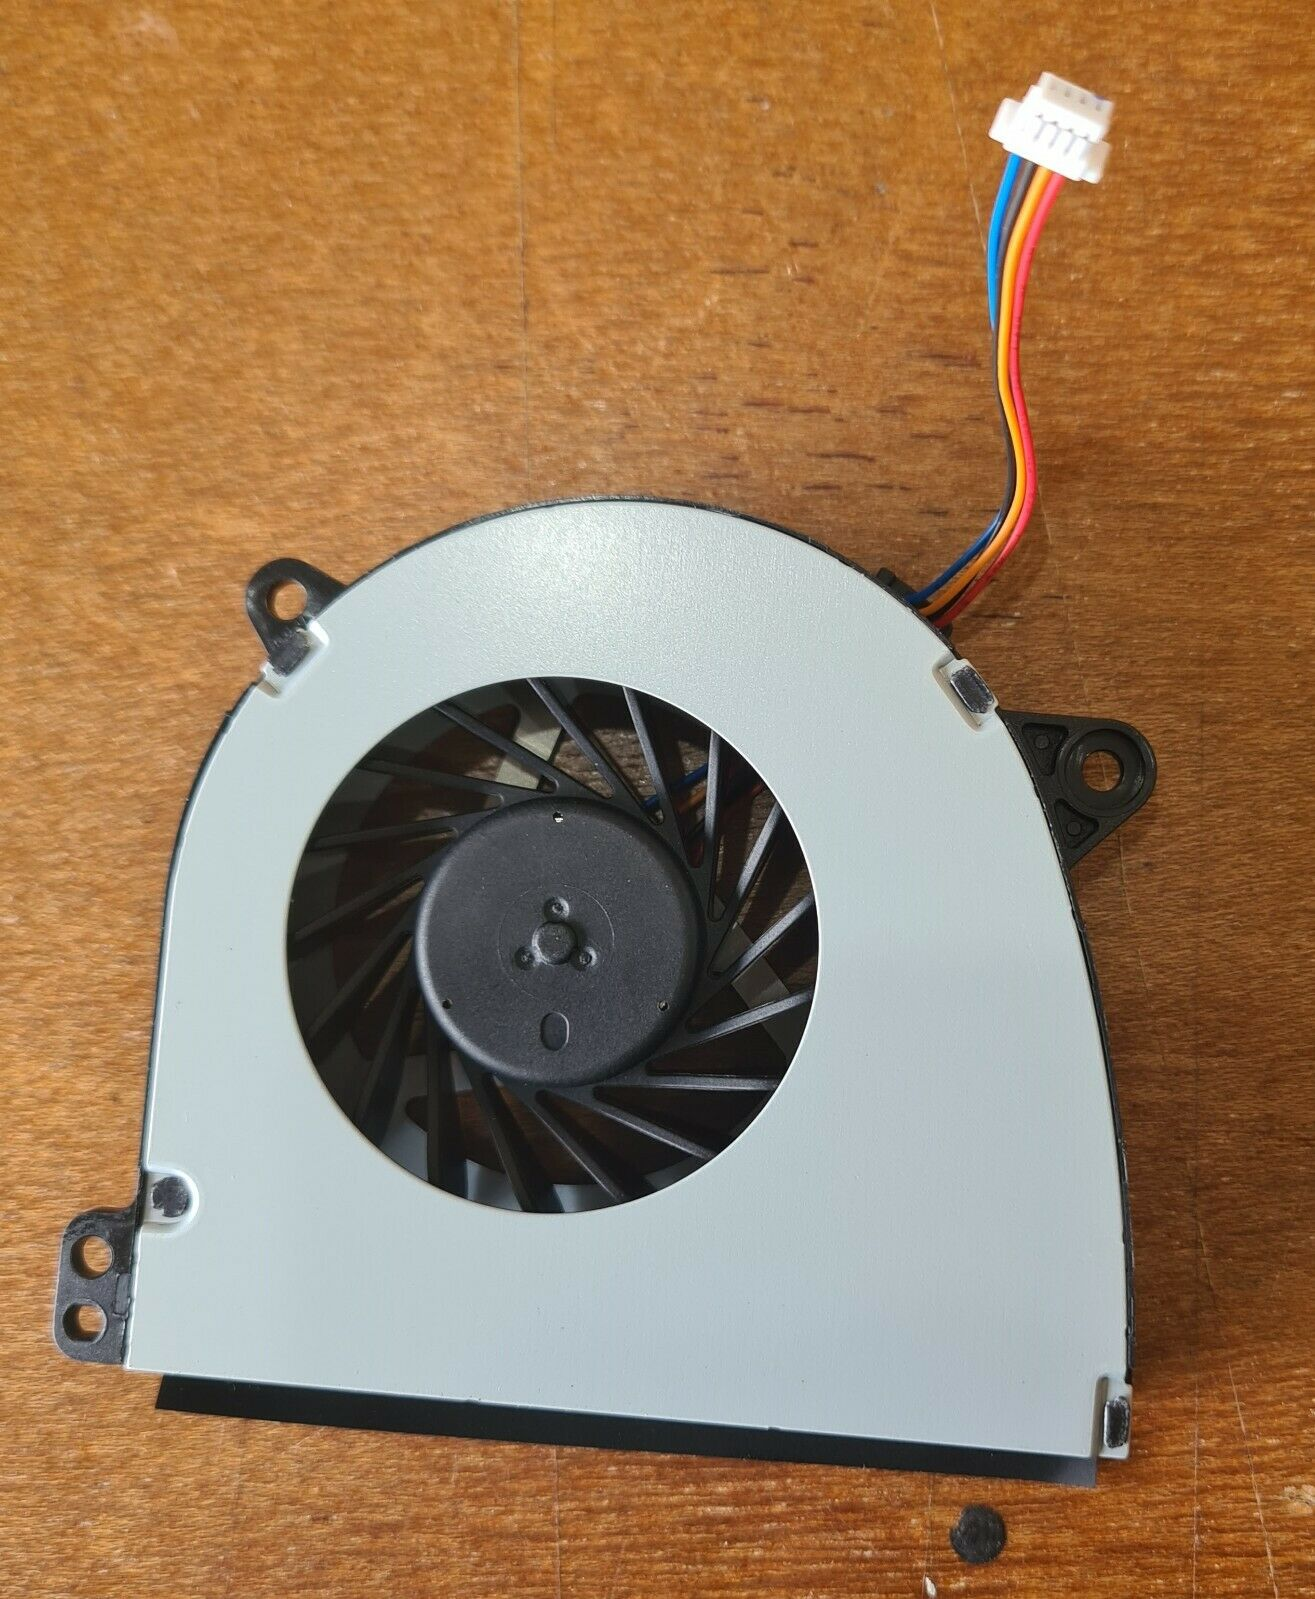 NEW cooler fan for toshiba Tecra A50-a G61C001H110 KDB0605HB CM96 DA28 G61C0001H